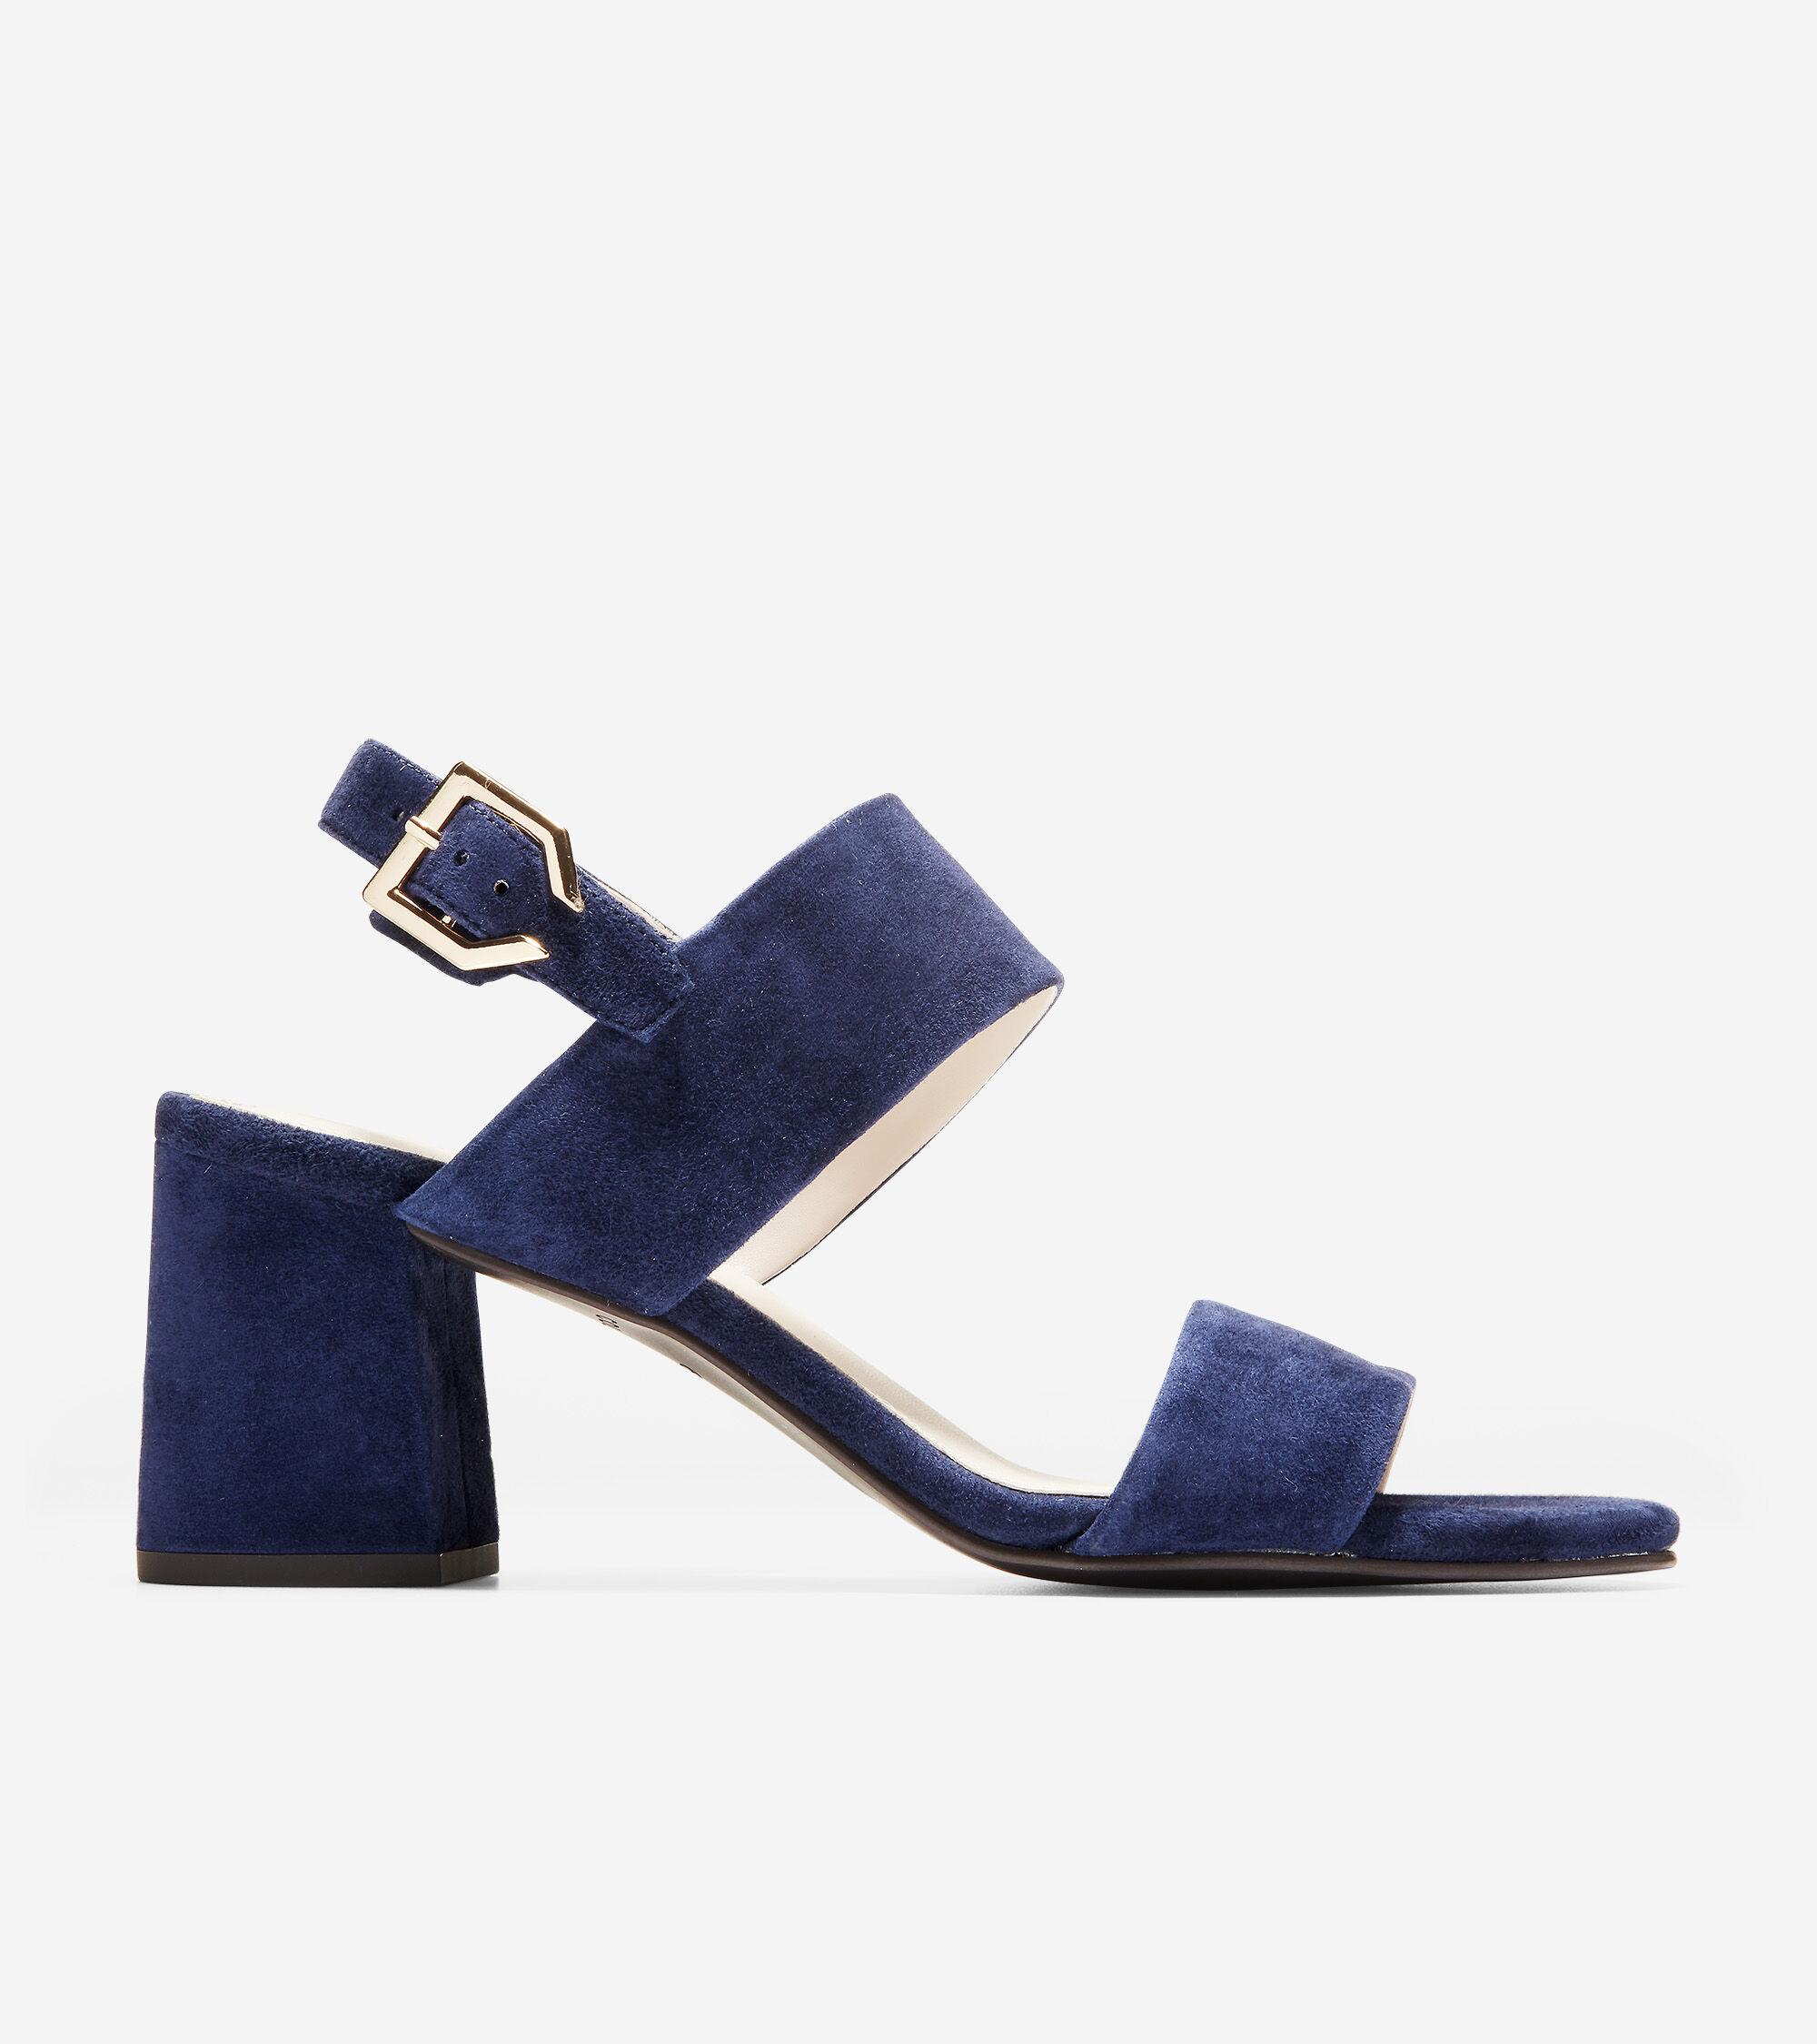 7c2c7cc0fc8 Women s Avani City Sandals 65mm in Marine Blue